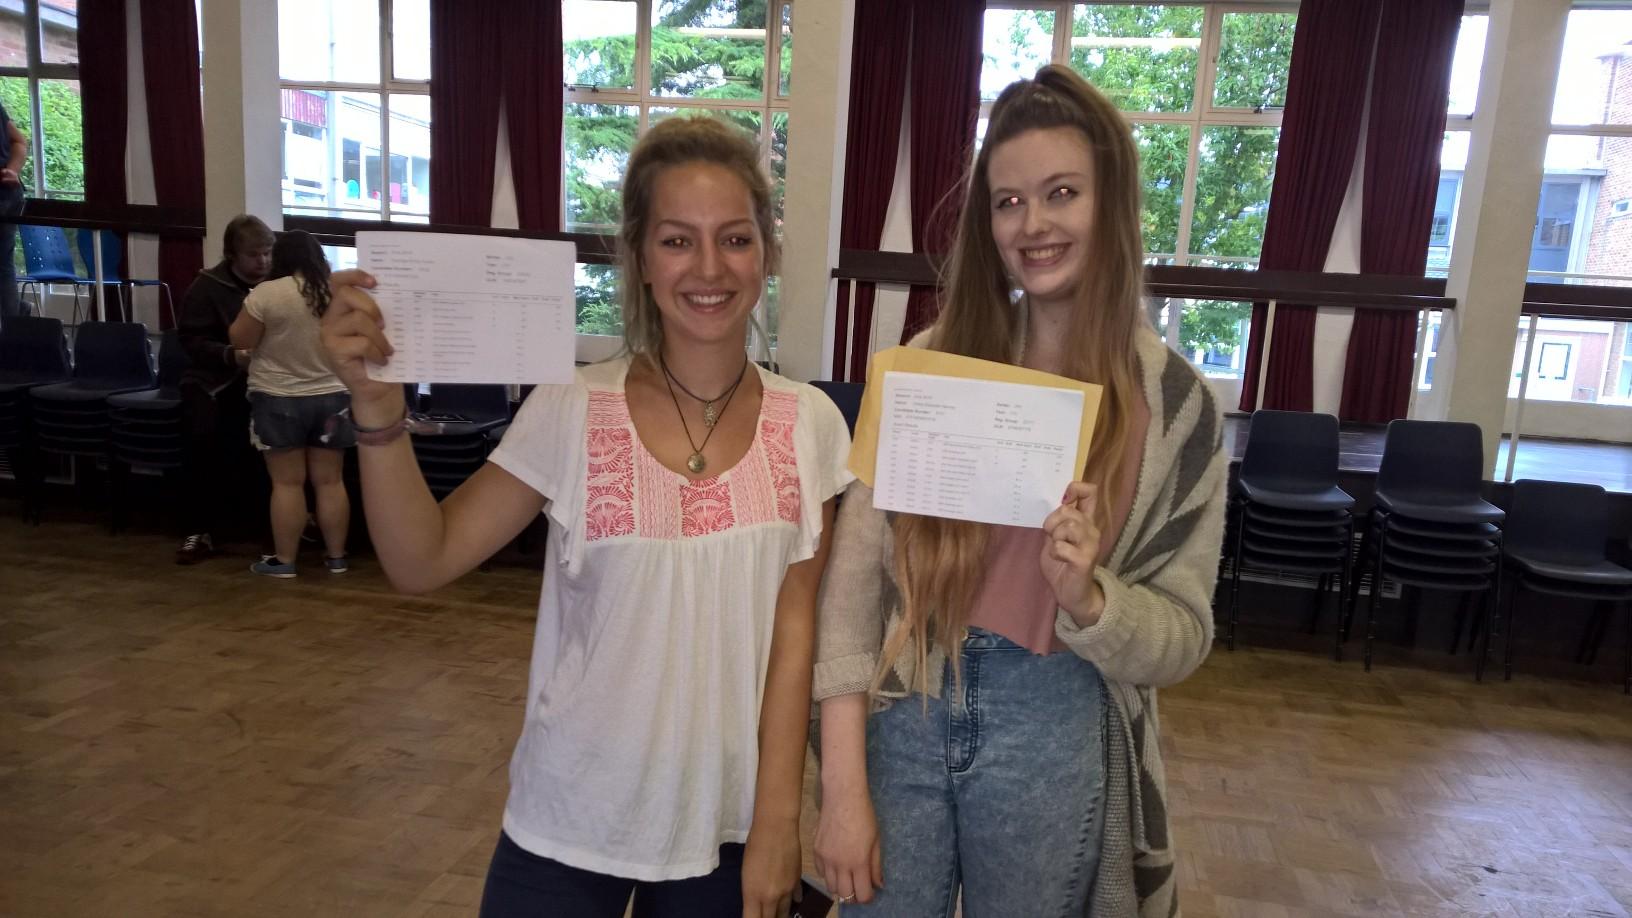 Platts hyundai used car dealership in high wycombe - A Level Results Furze Platt Senior School From Royal Borough Observer